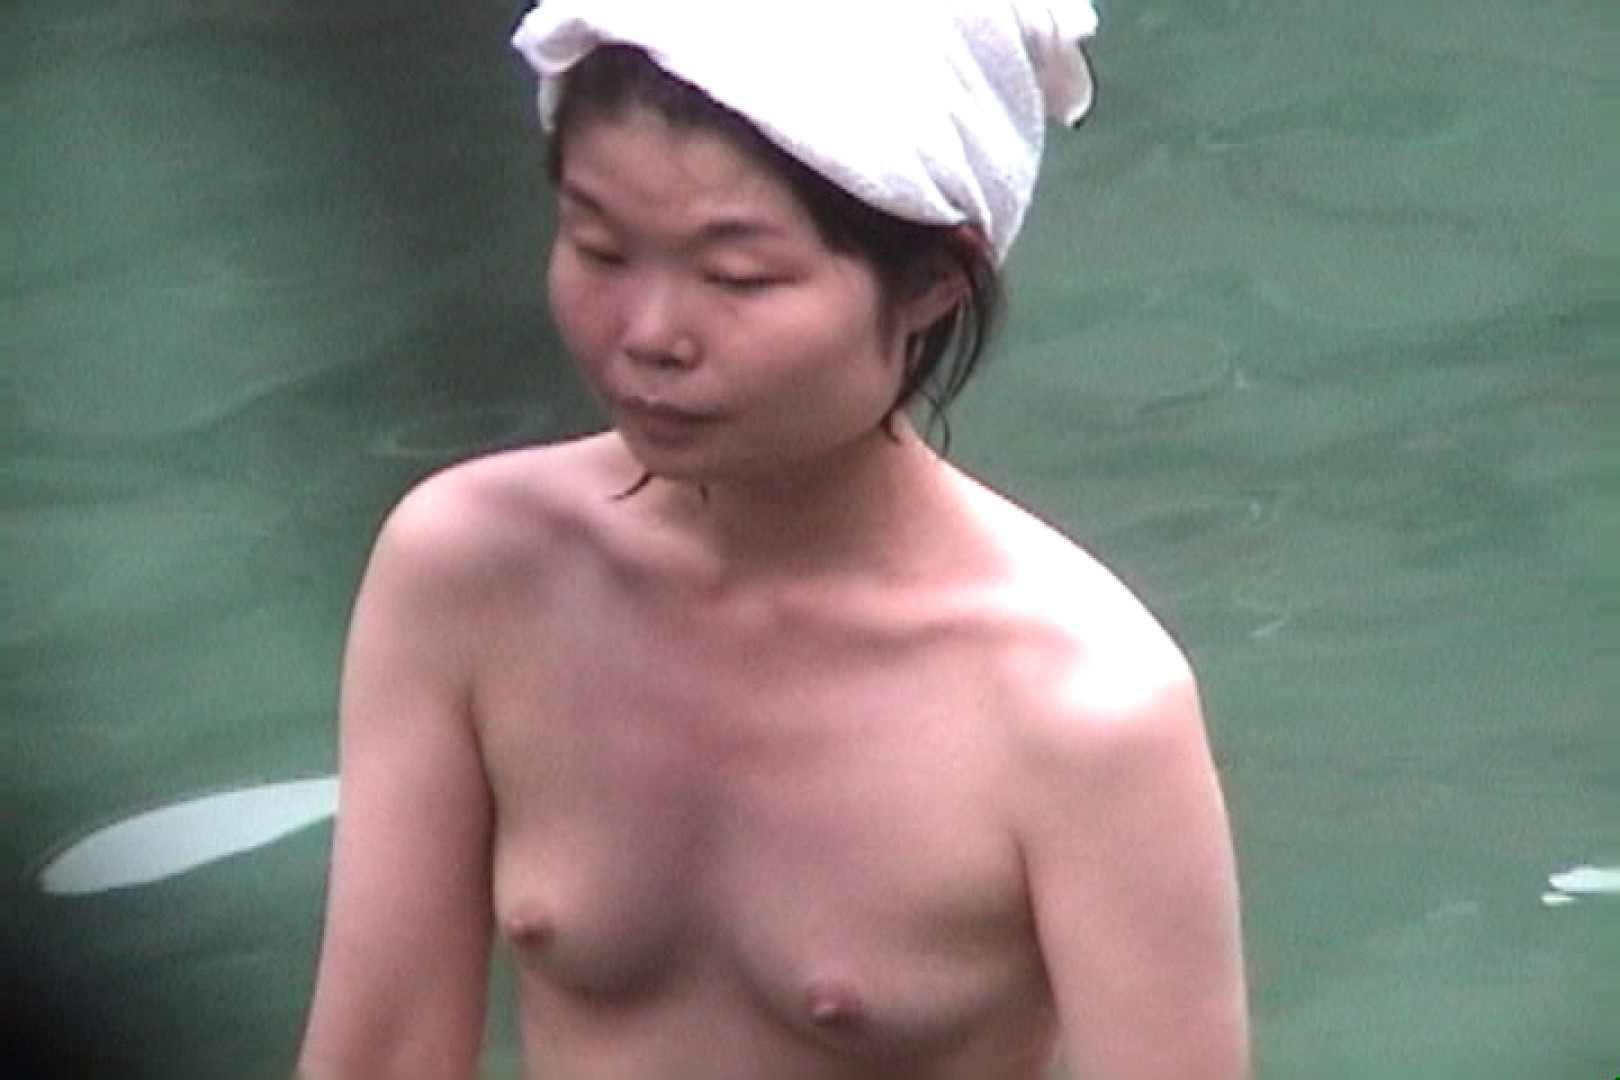 Aquaな露天風呂Vol.71【VIP限定】 盗撮 のぞき動画画像 107画像 47